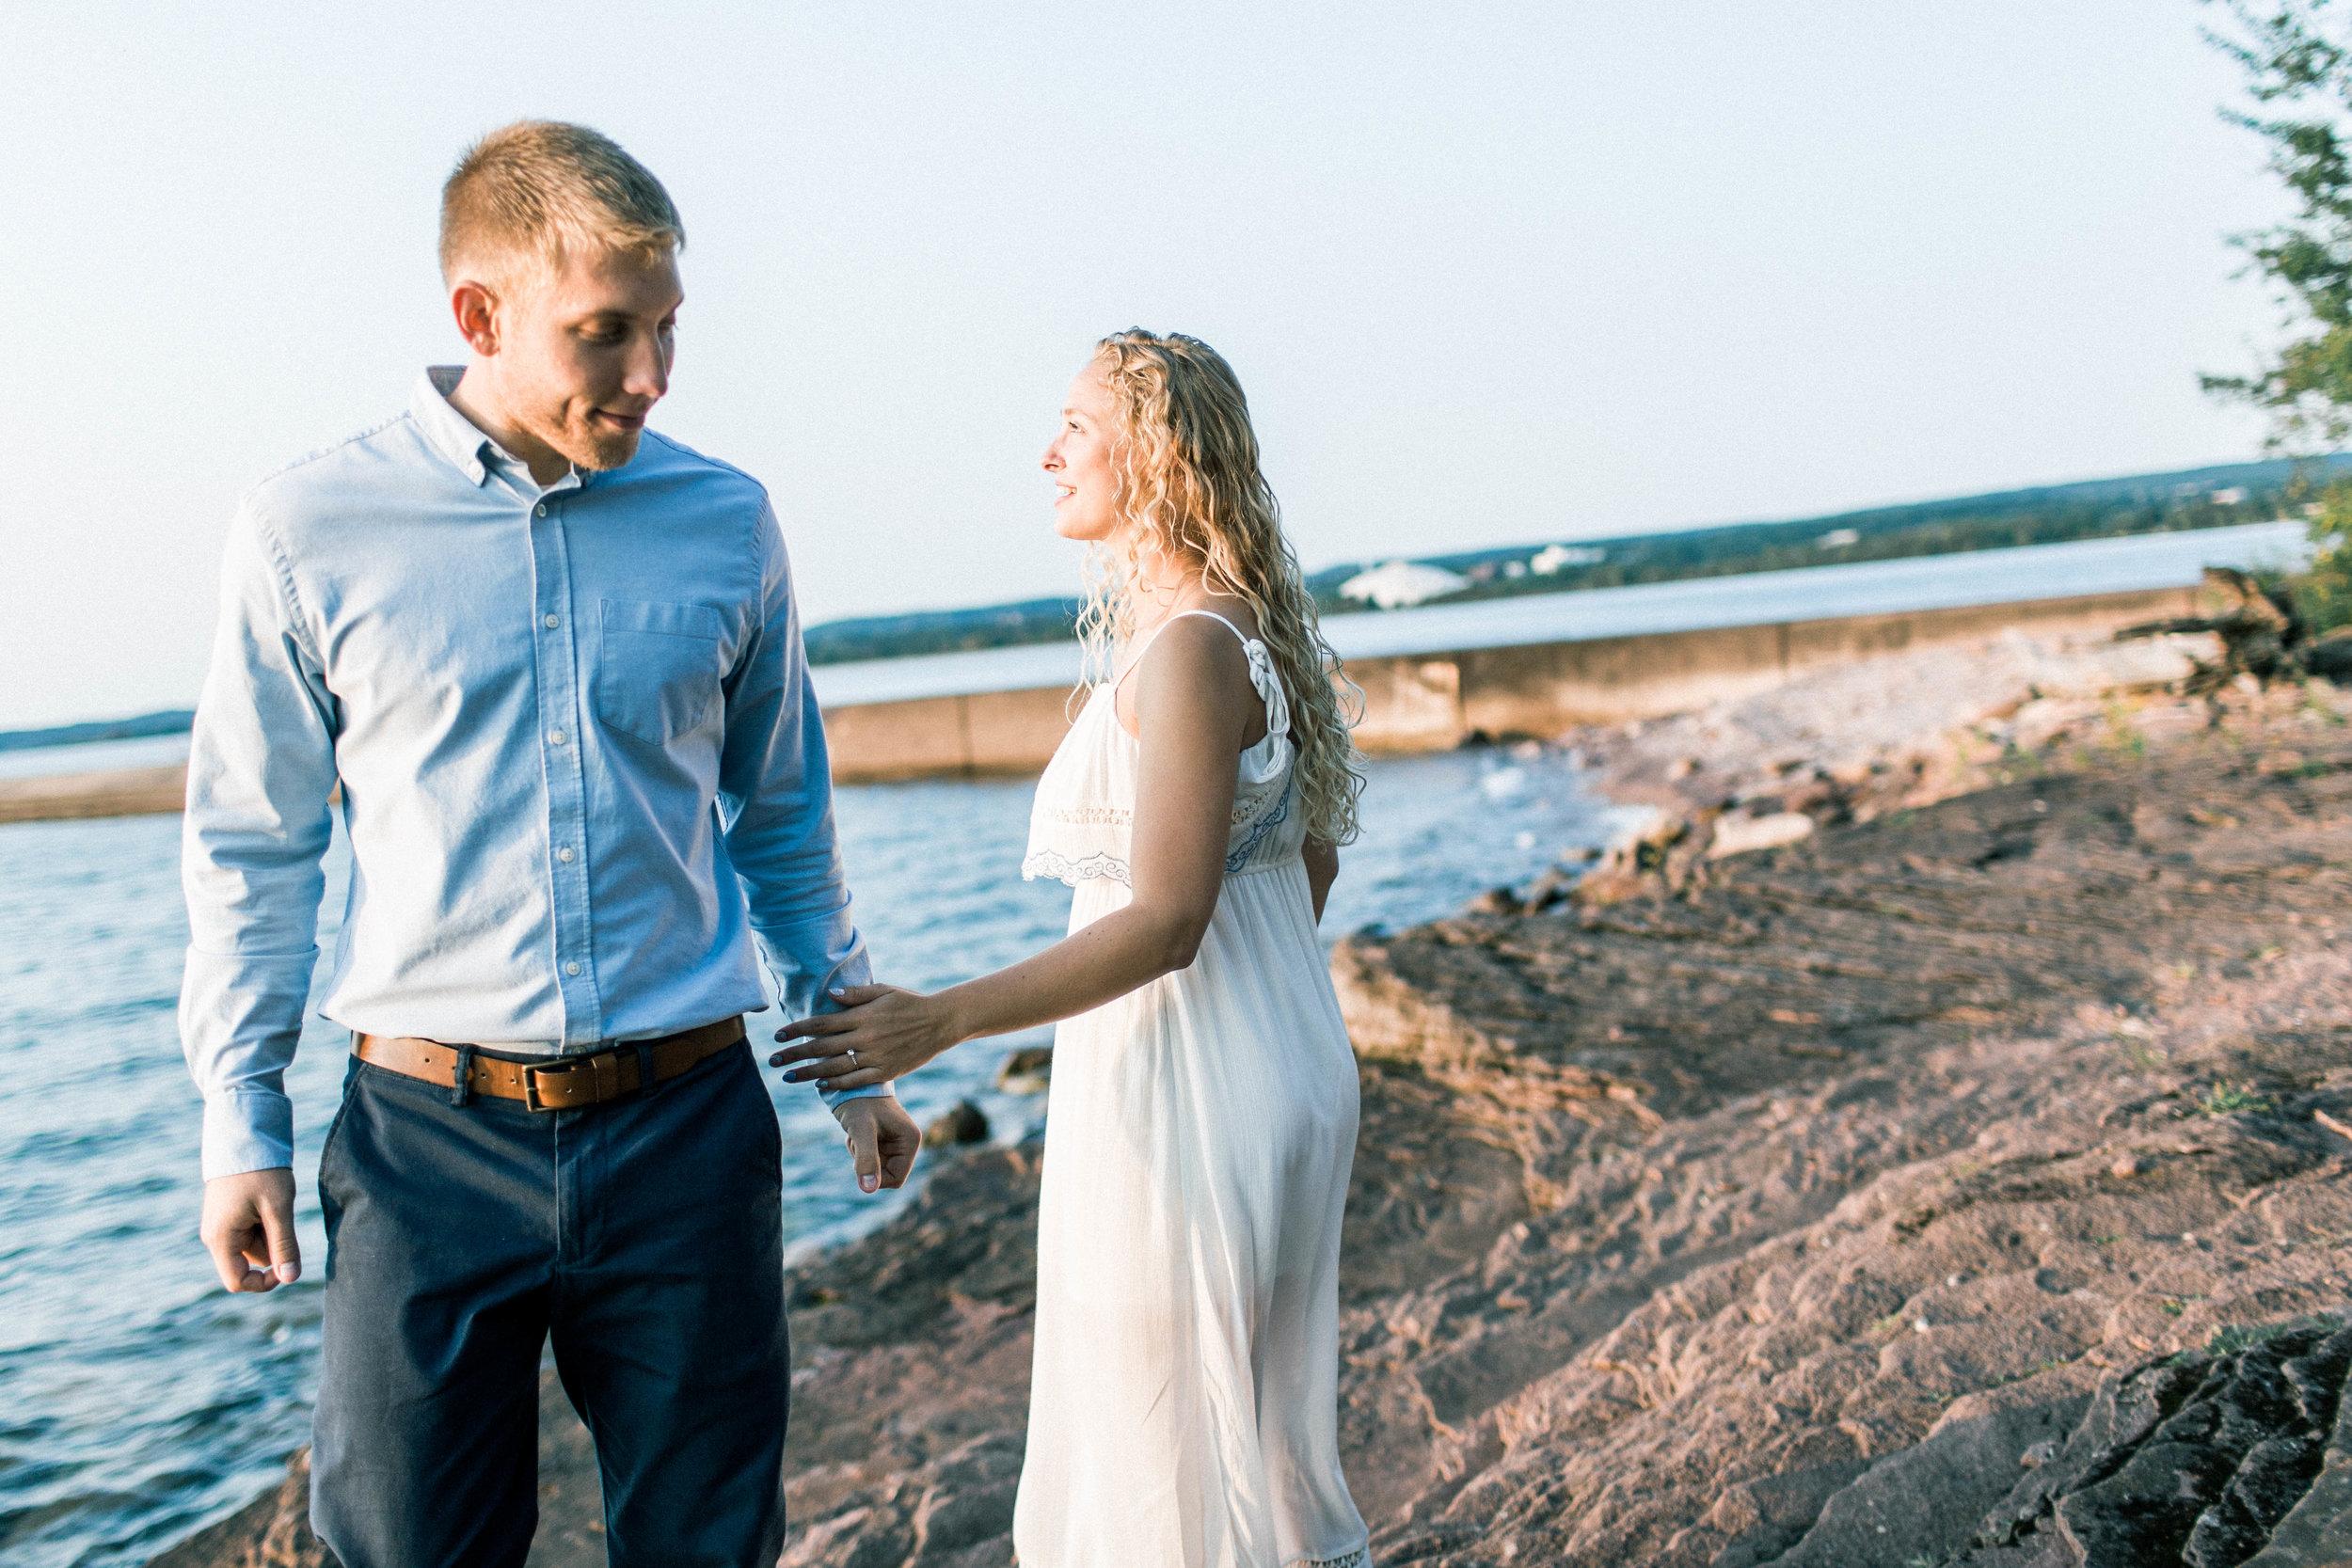 Northern Michigan Engagement Photographer - Lauren and Brent 007.jpg